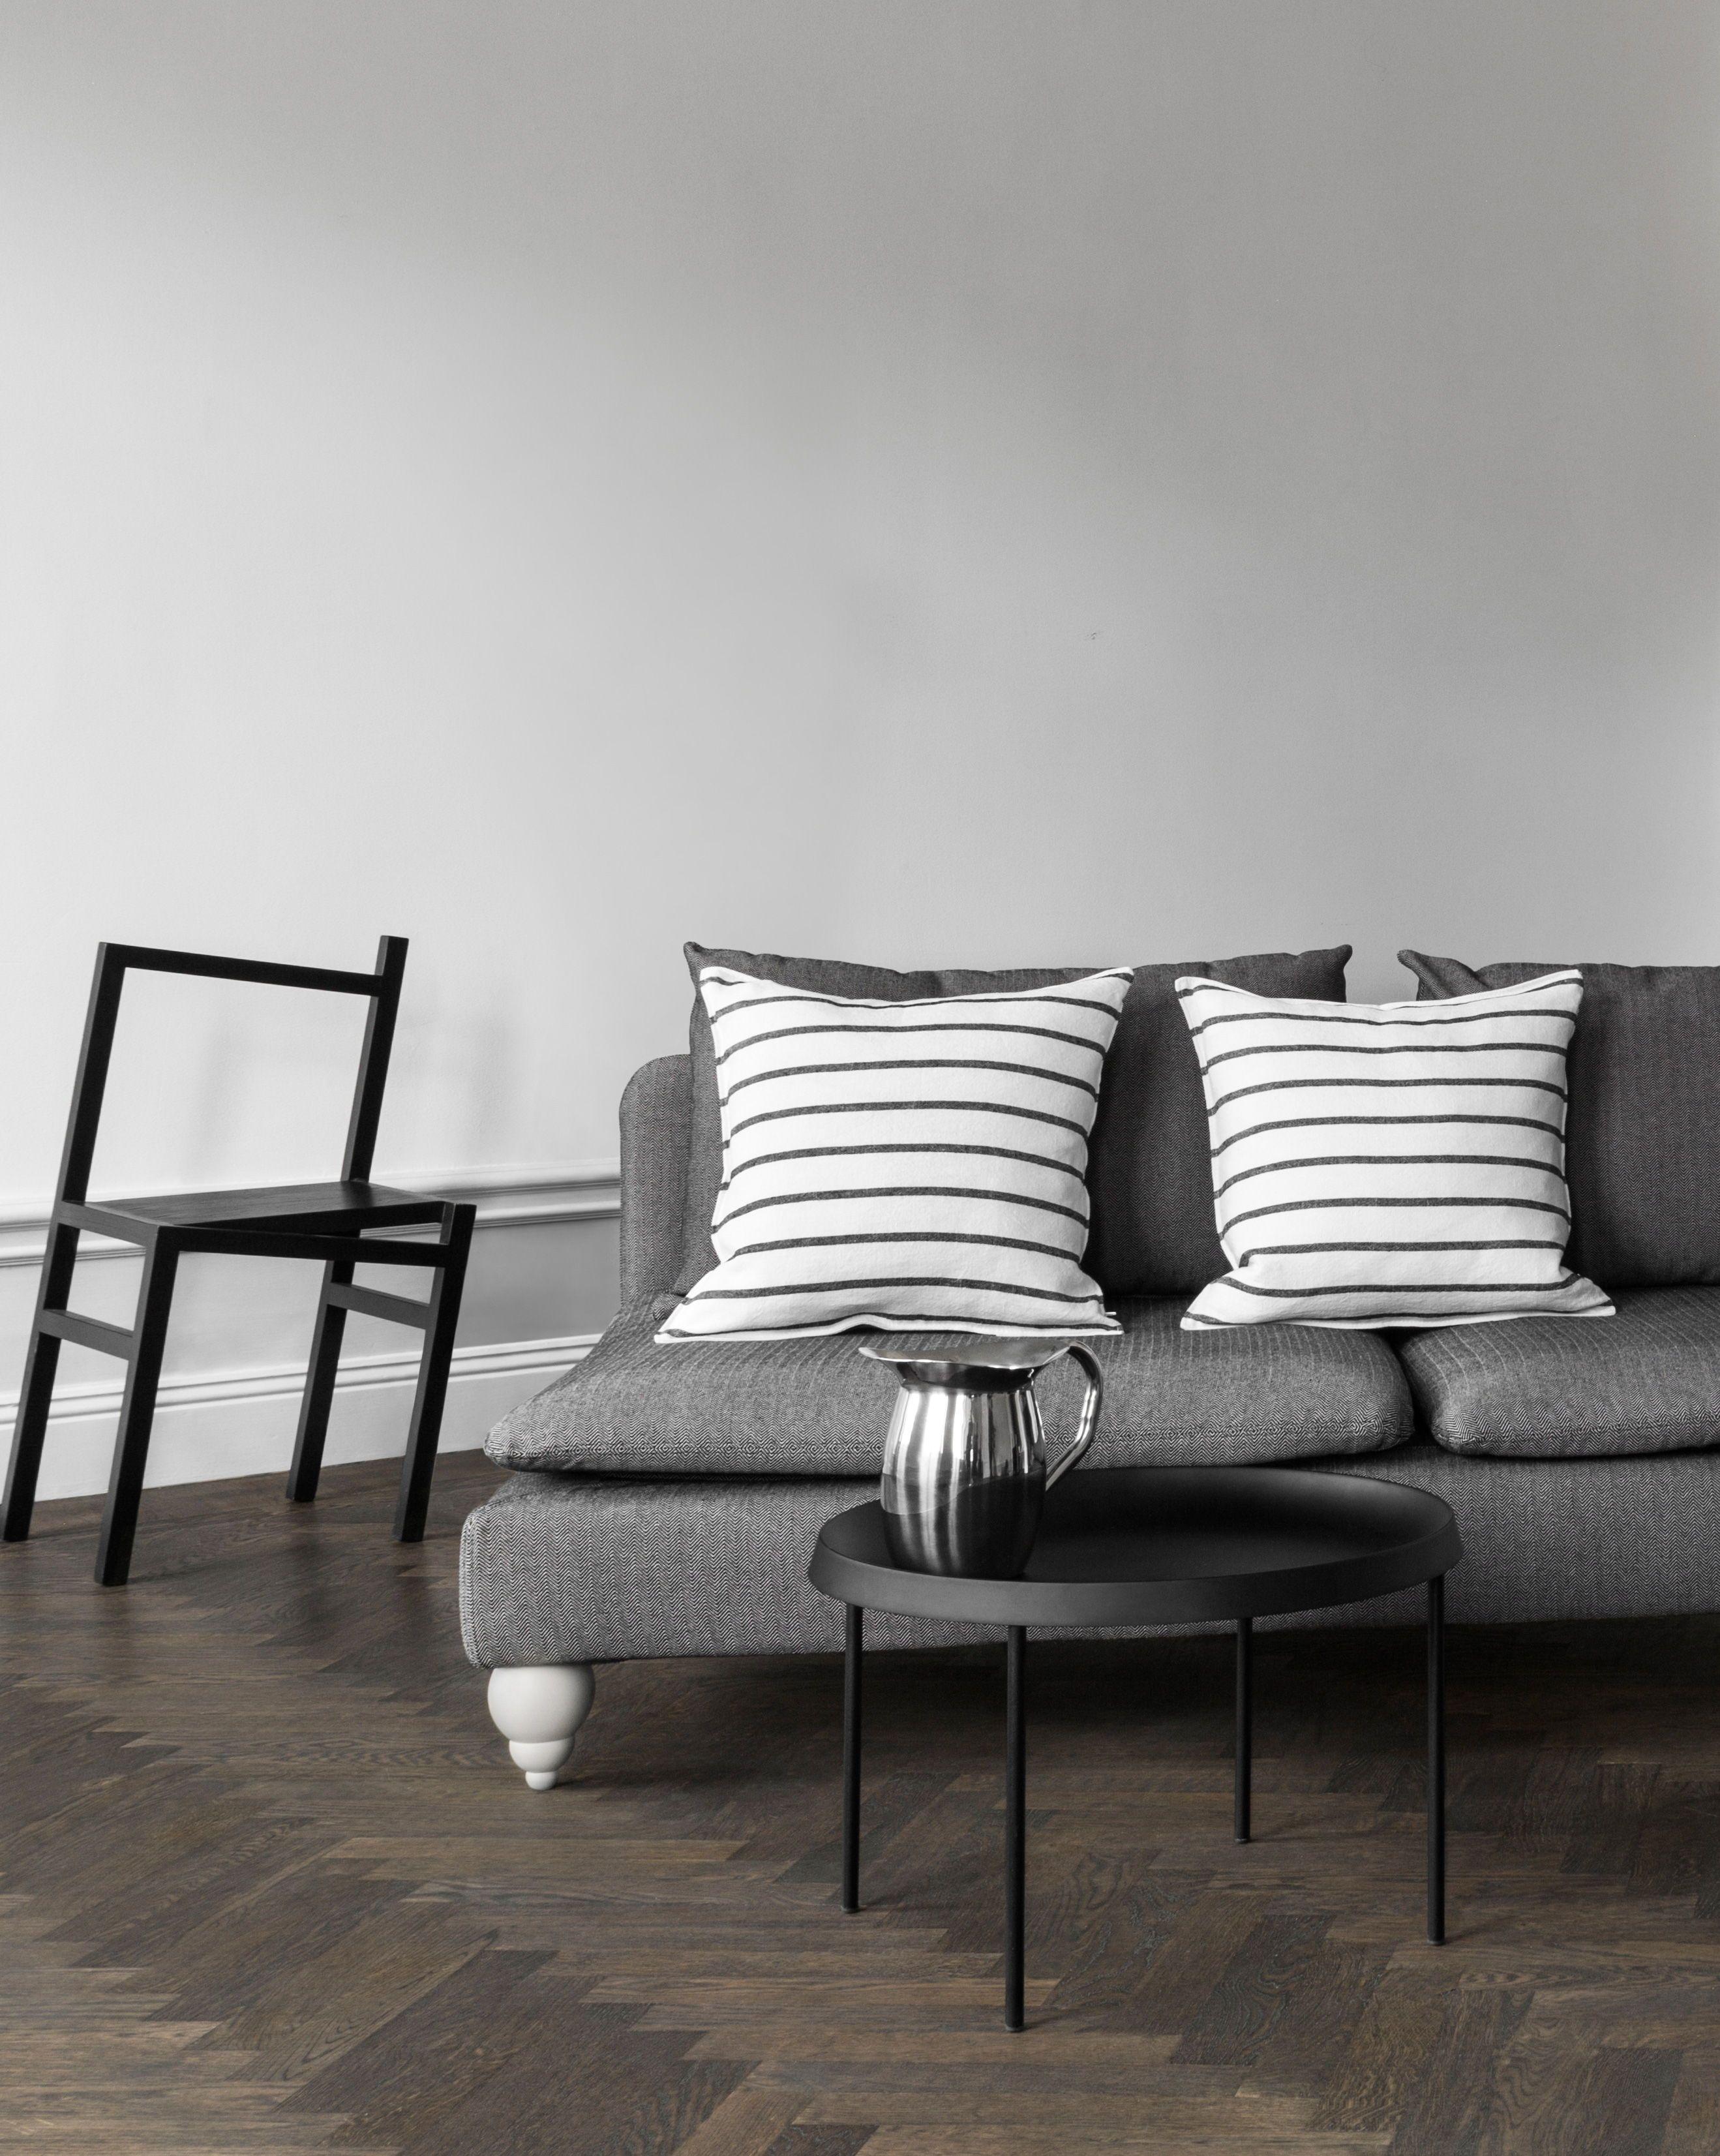 Sleek Minimalist Scandinavian Living Room With A Sophisticated Monochromatic Colour Palette Dark Herringbone Floors And Gr Furniture Ikea Sofa Furniture Legs